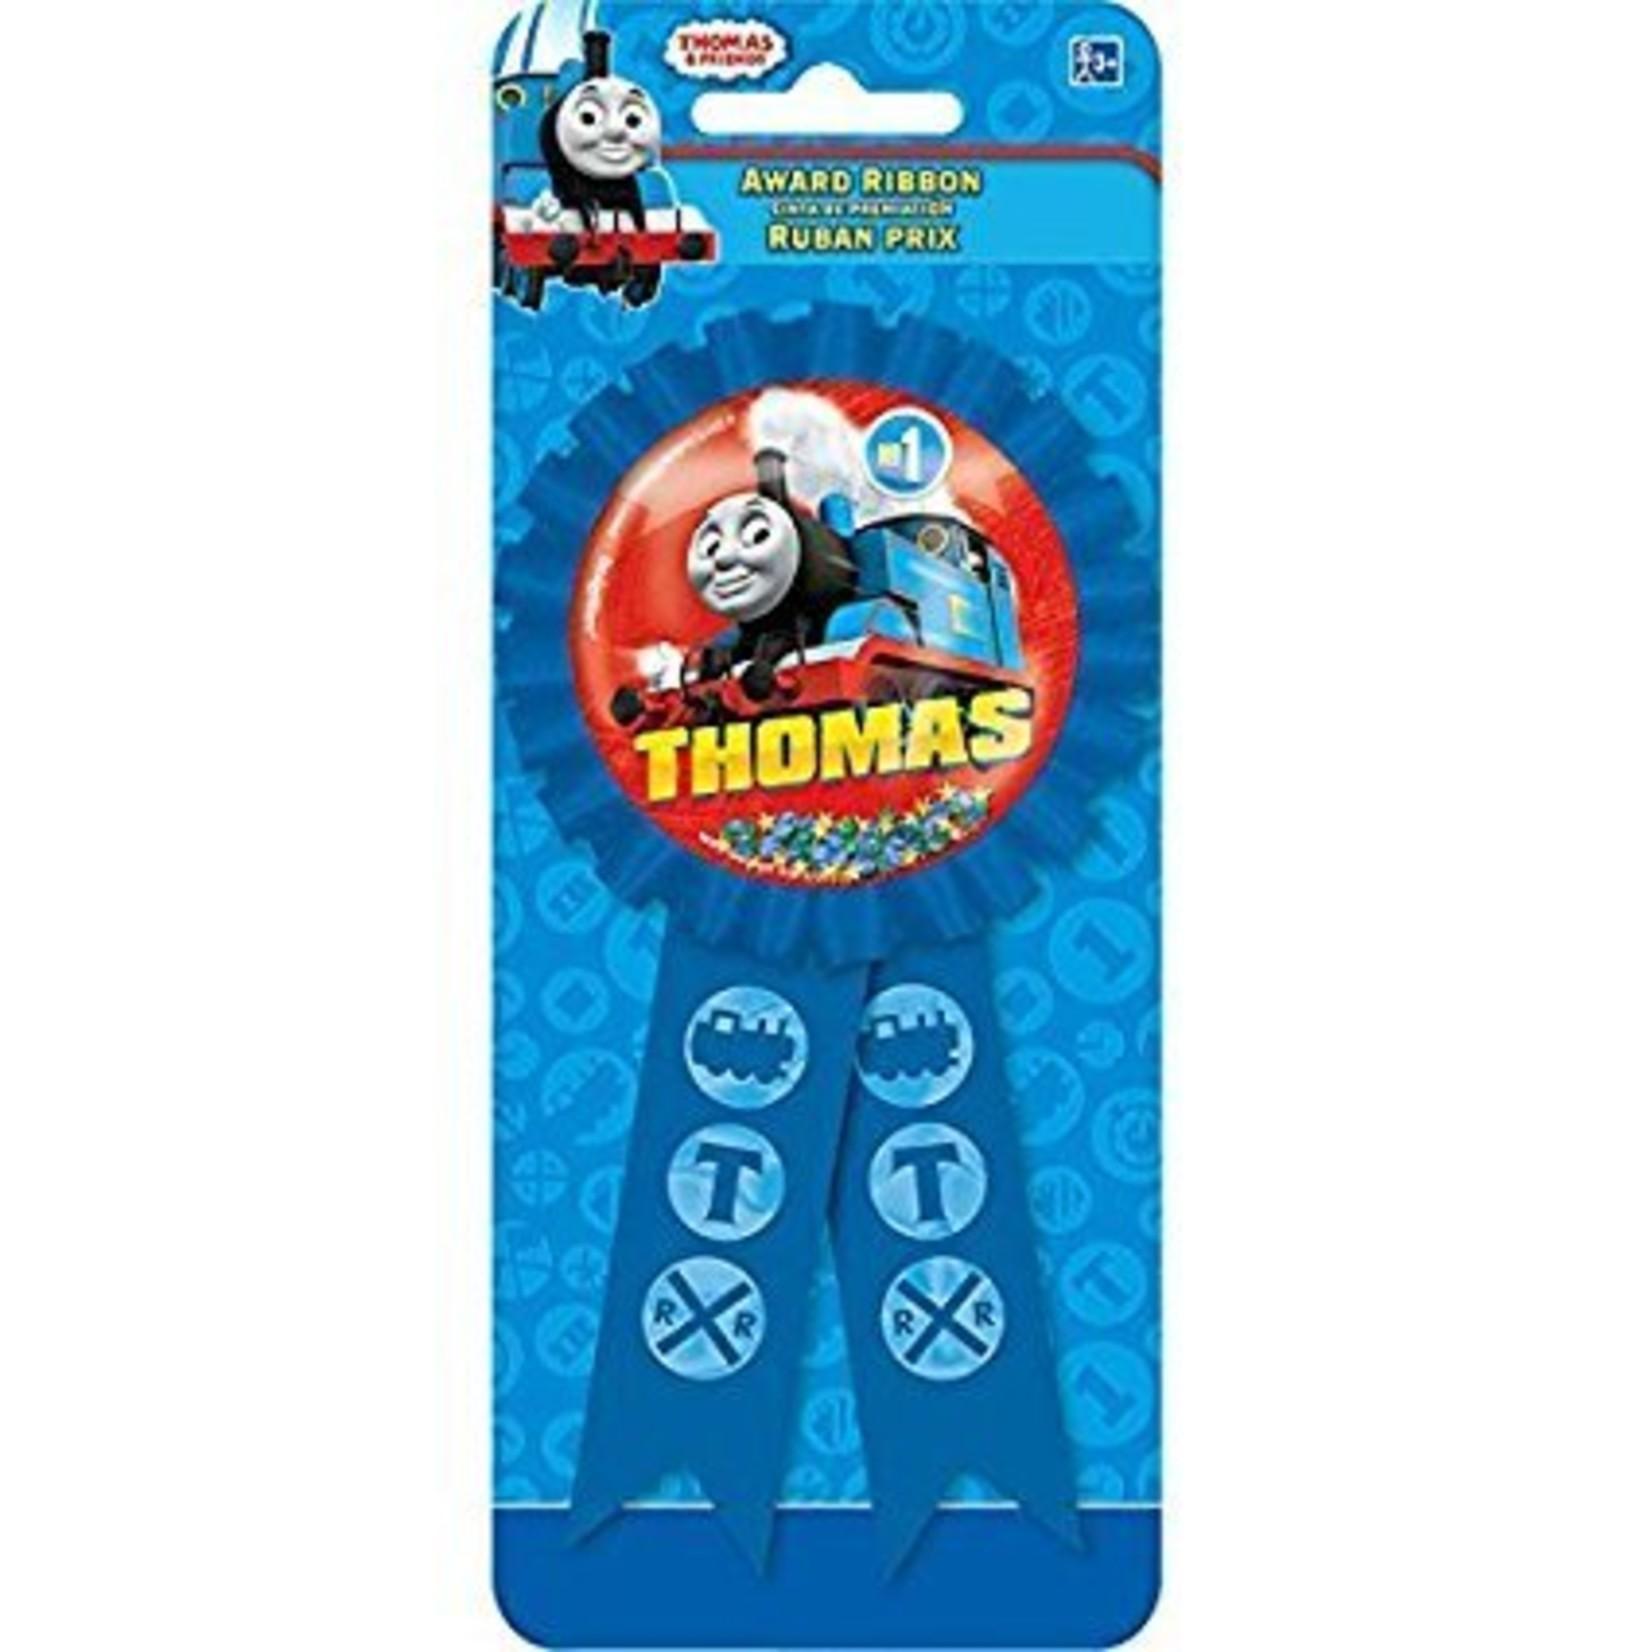 Award Ribbon-Thomas & Friends